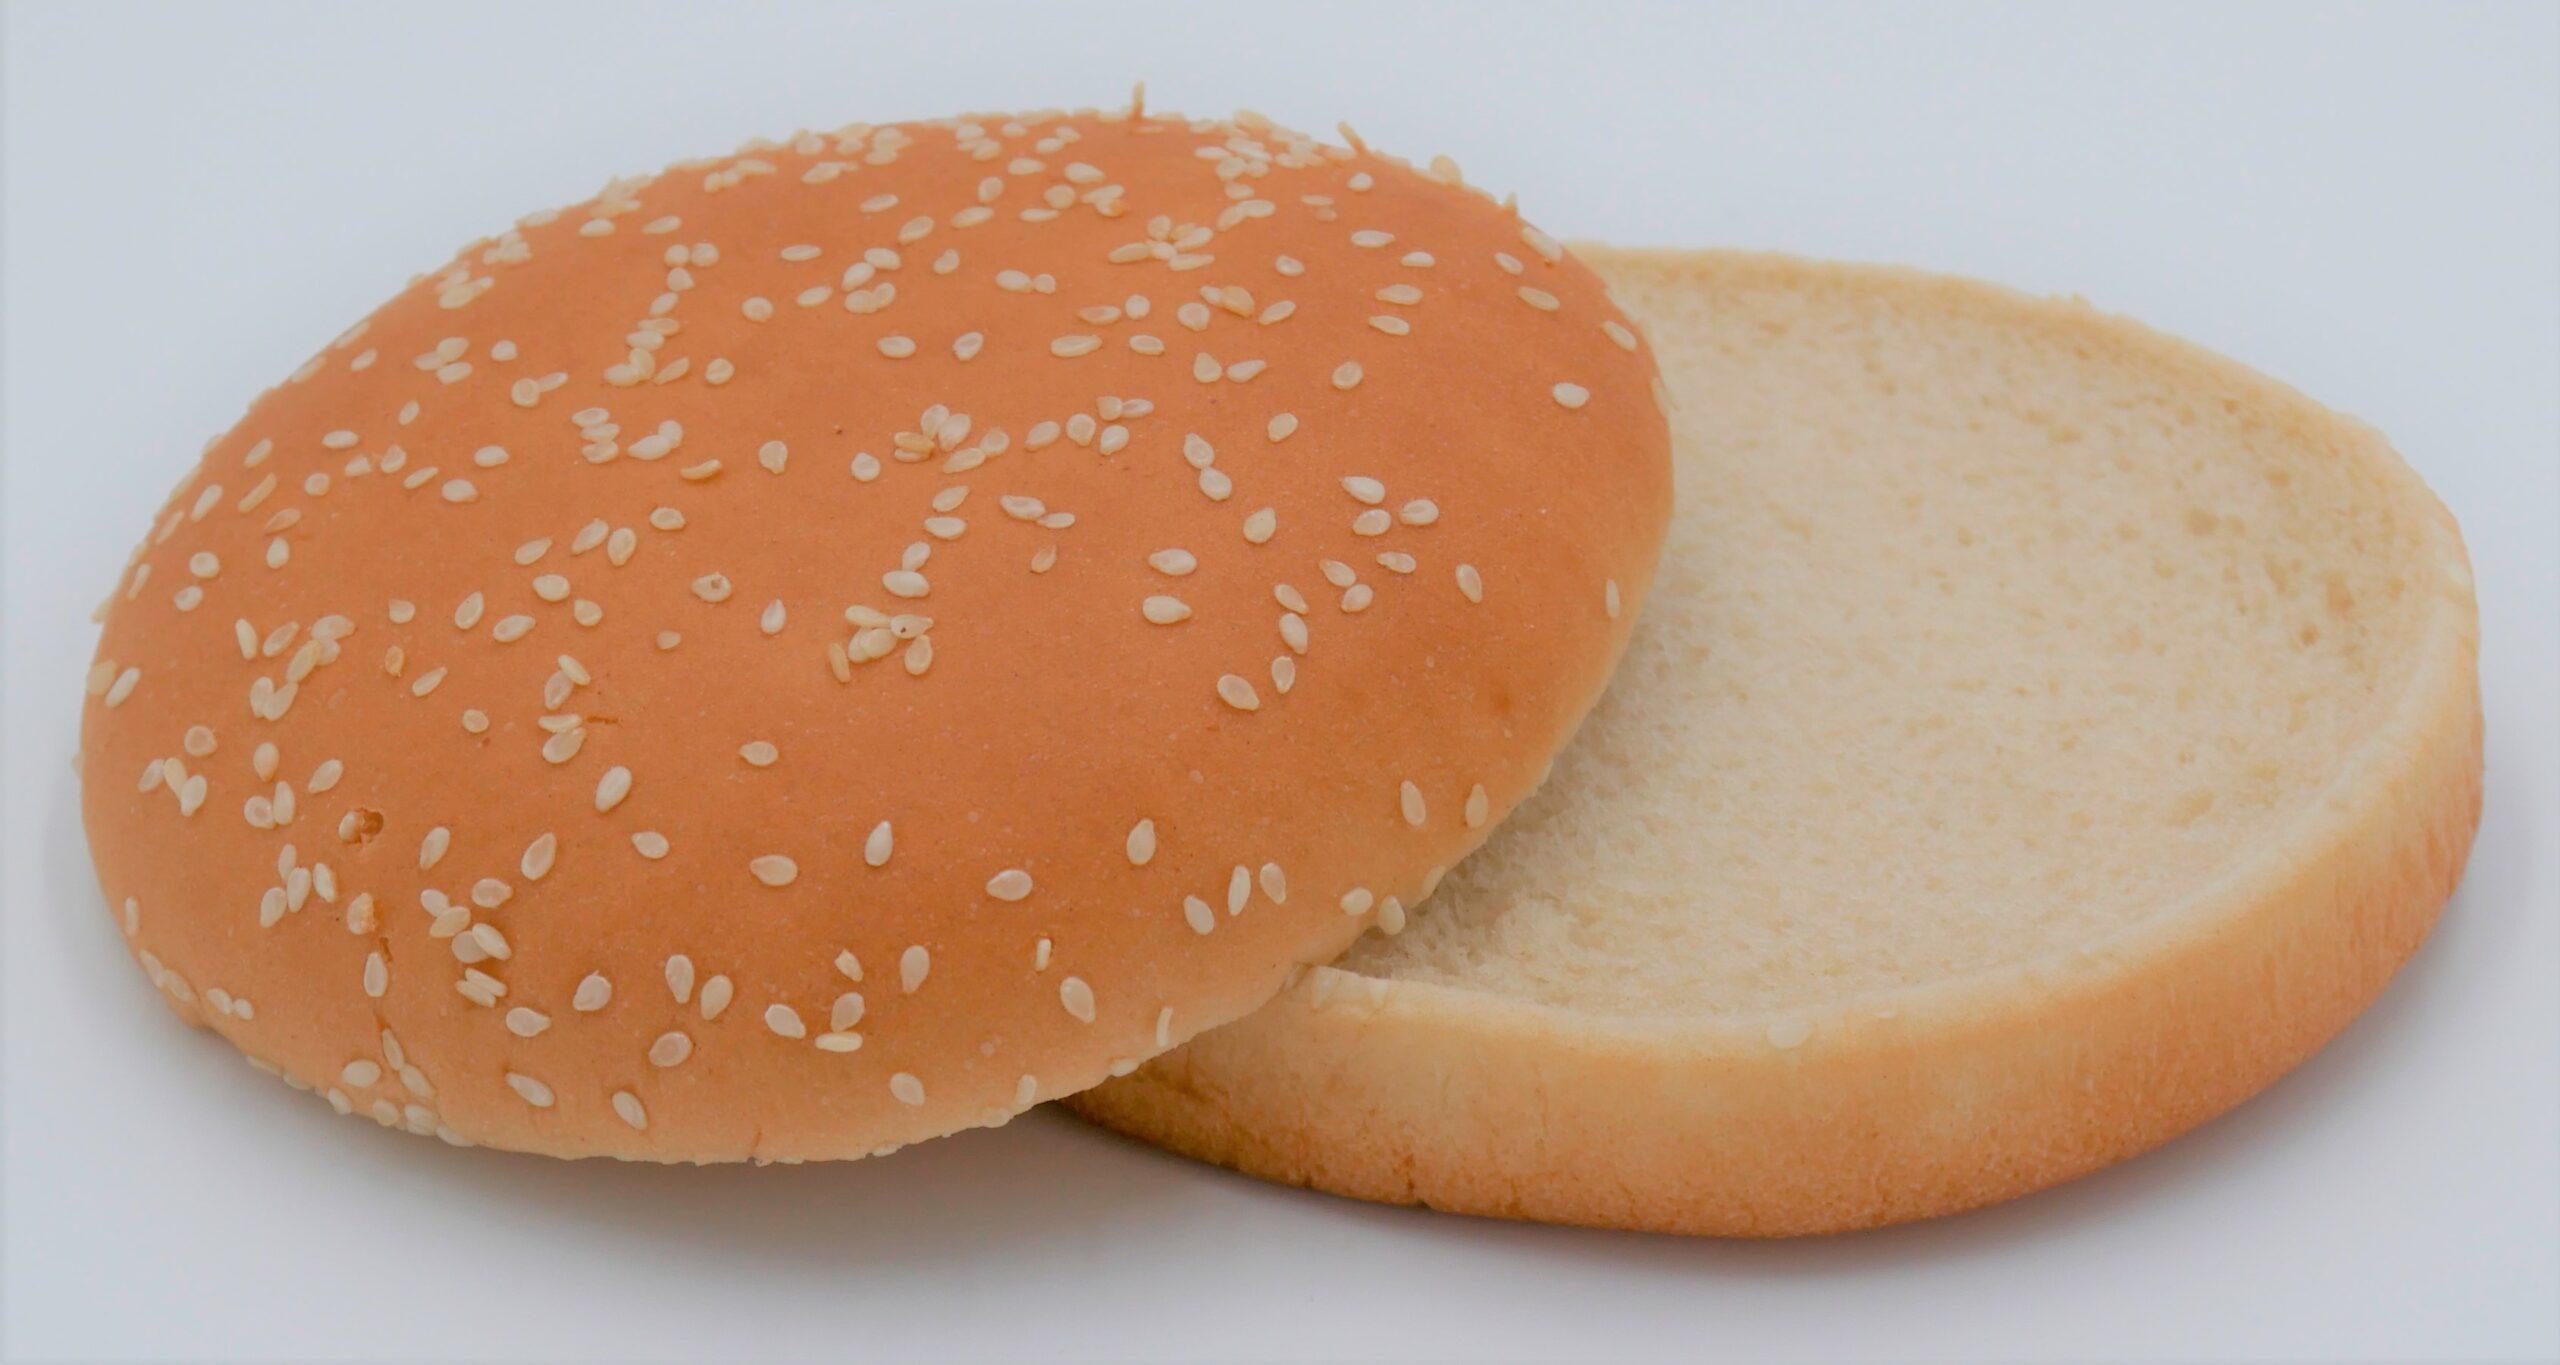 Hamburger Bun mit Sesam 81g Image